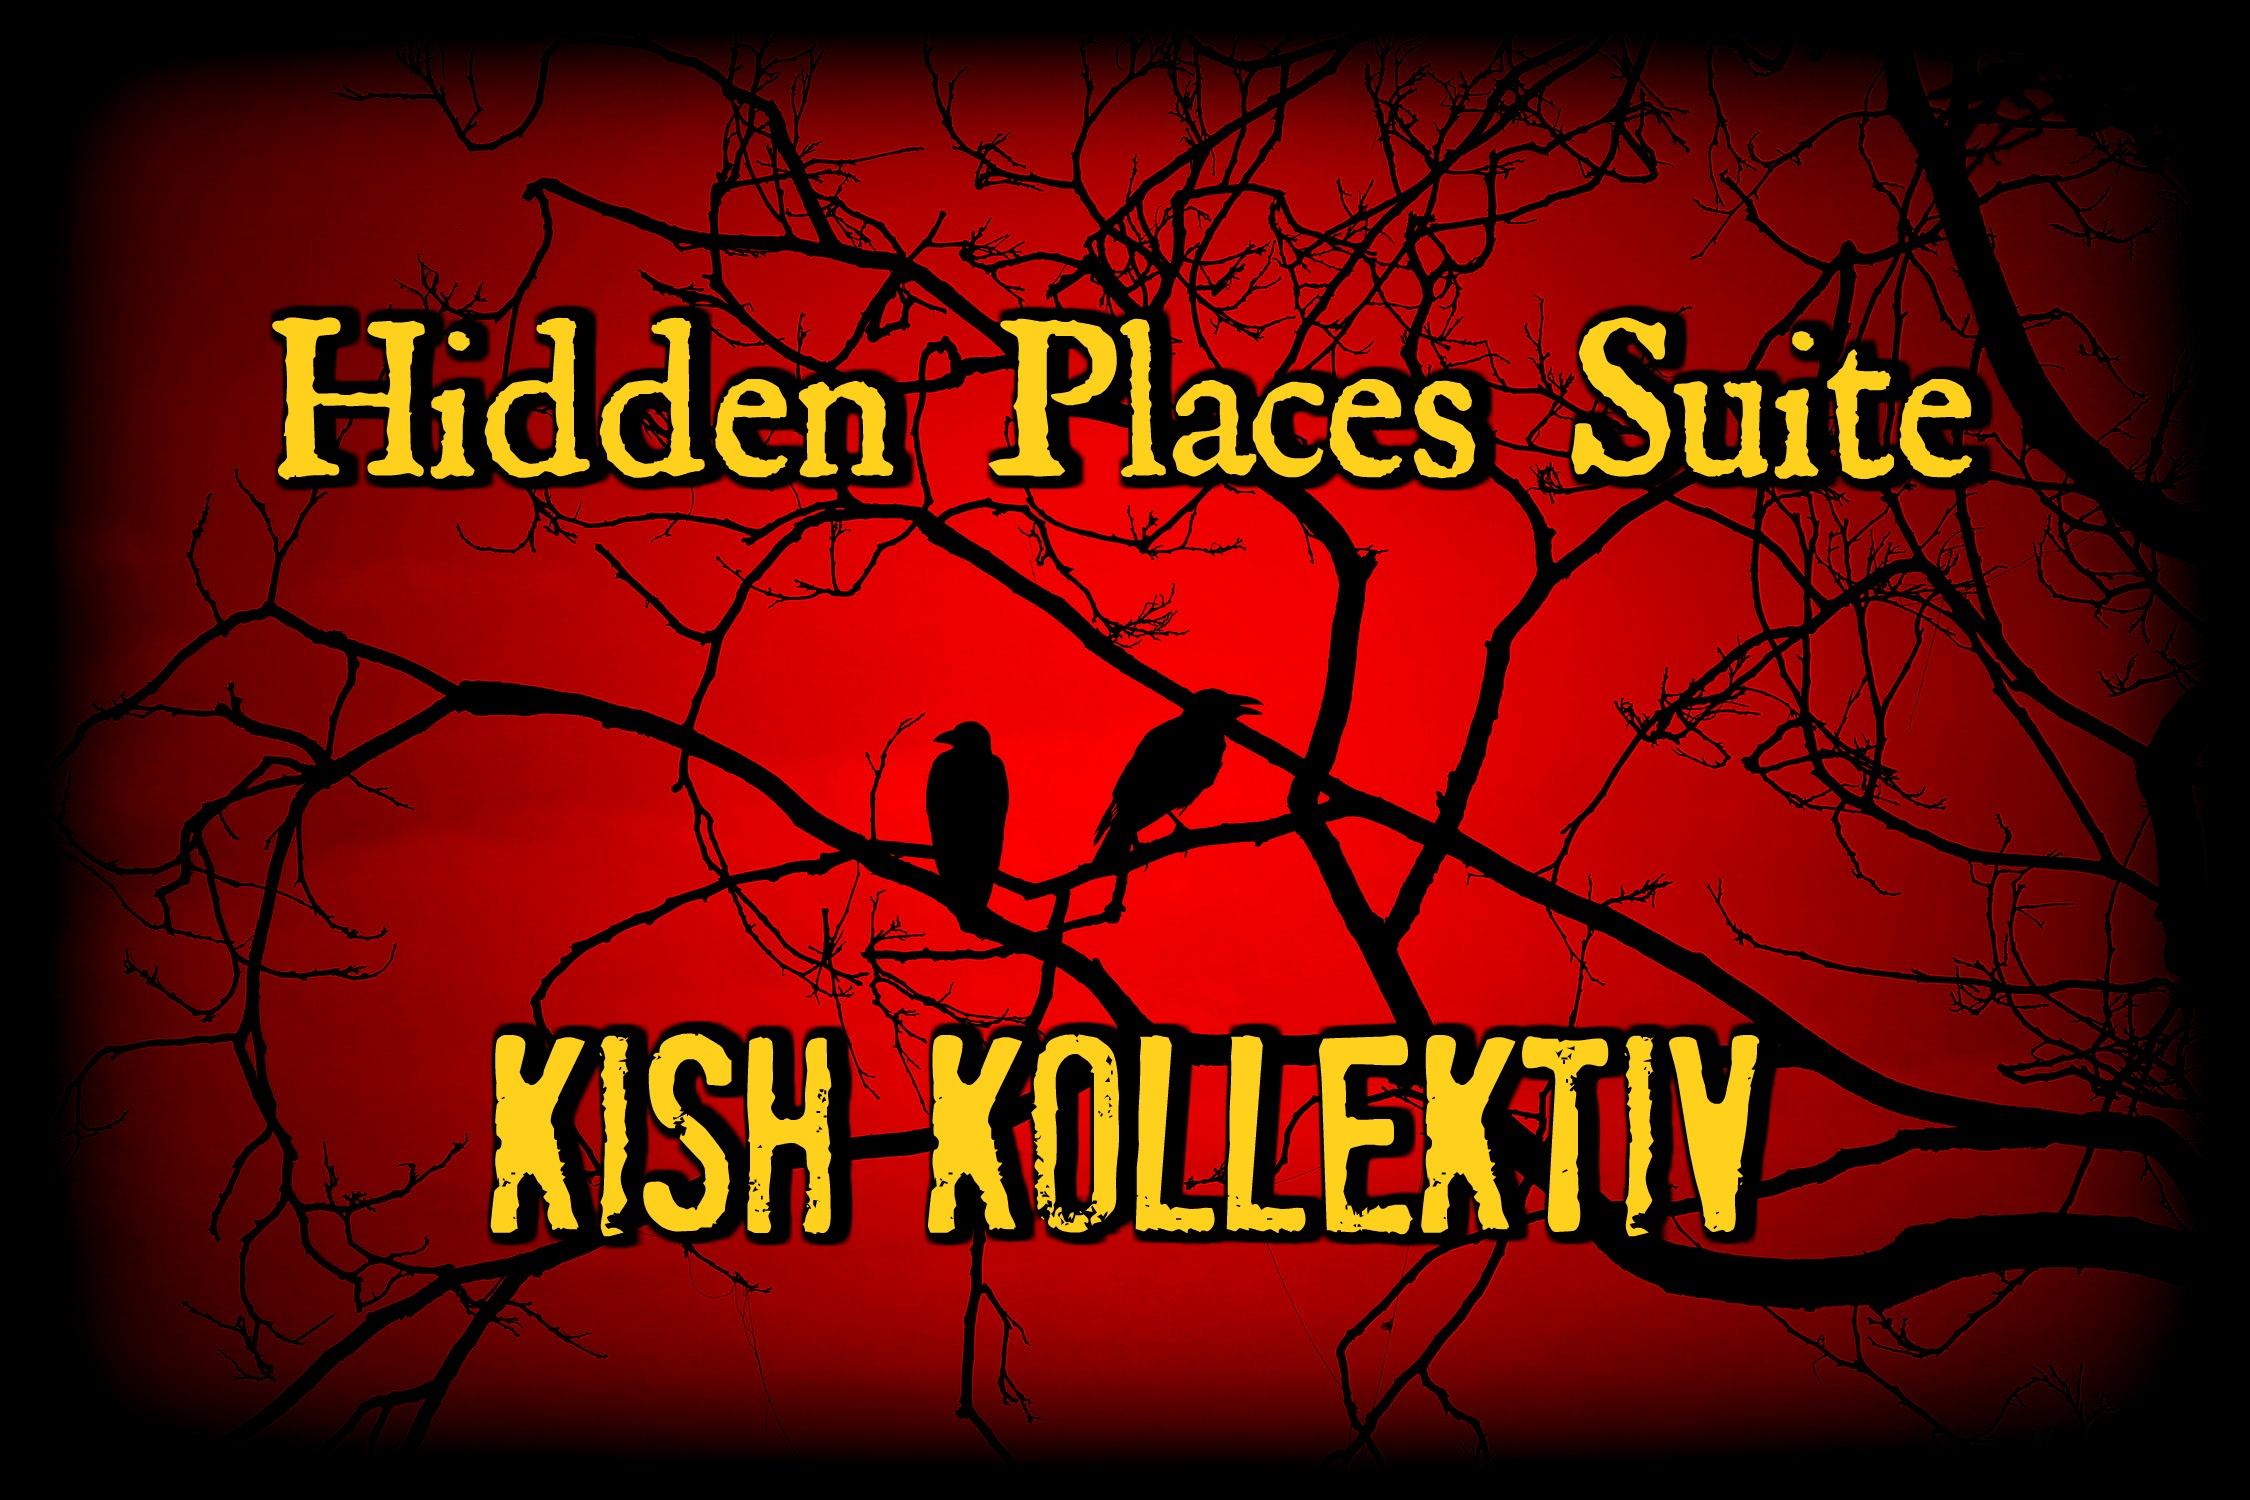 Spooky Season is here with Kish Kollectiv